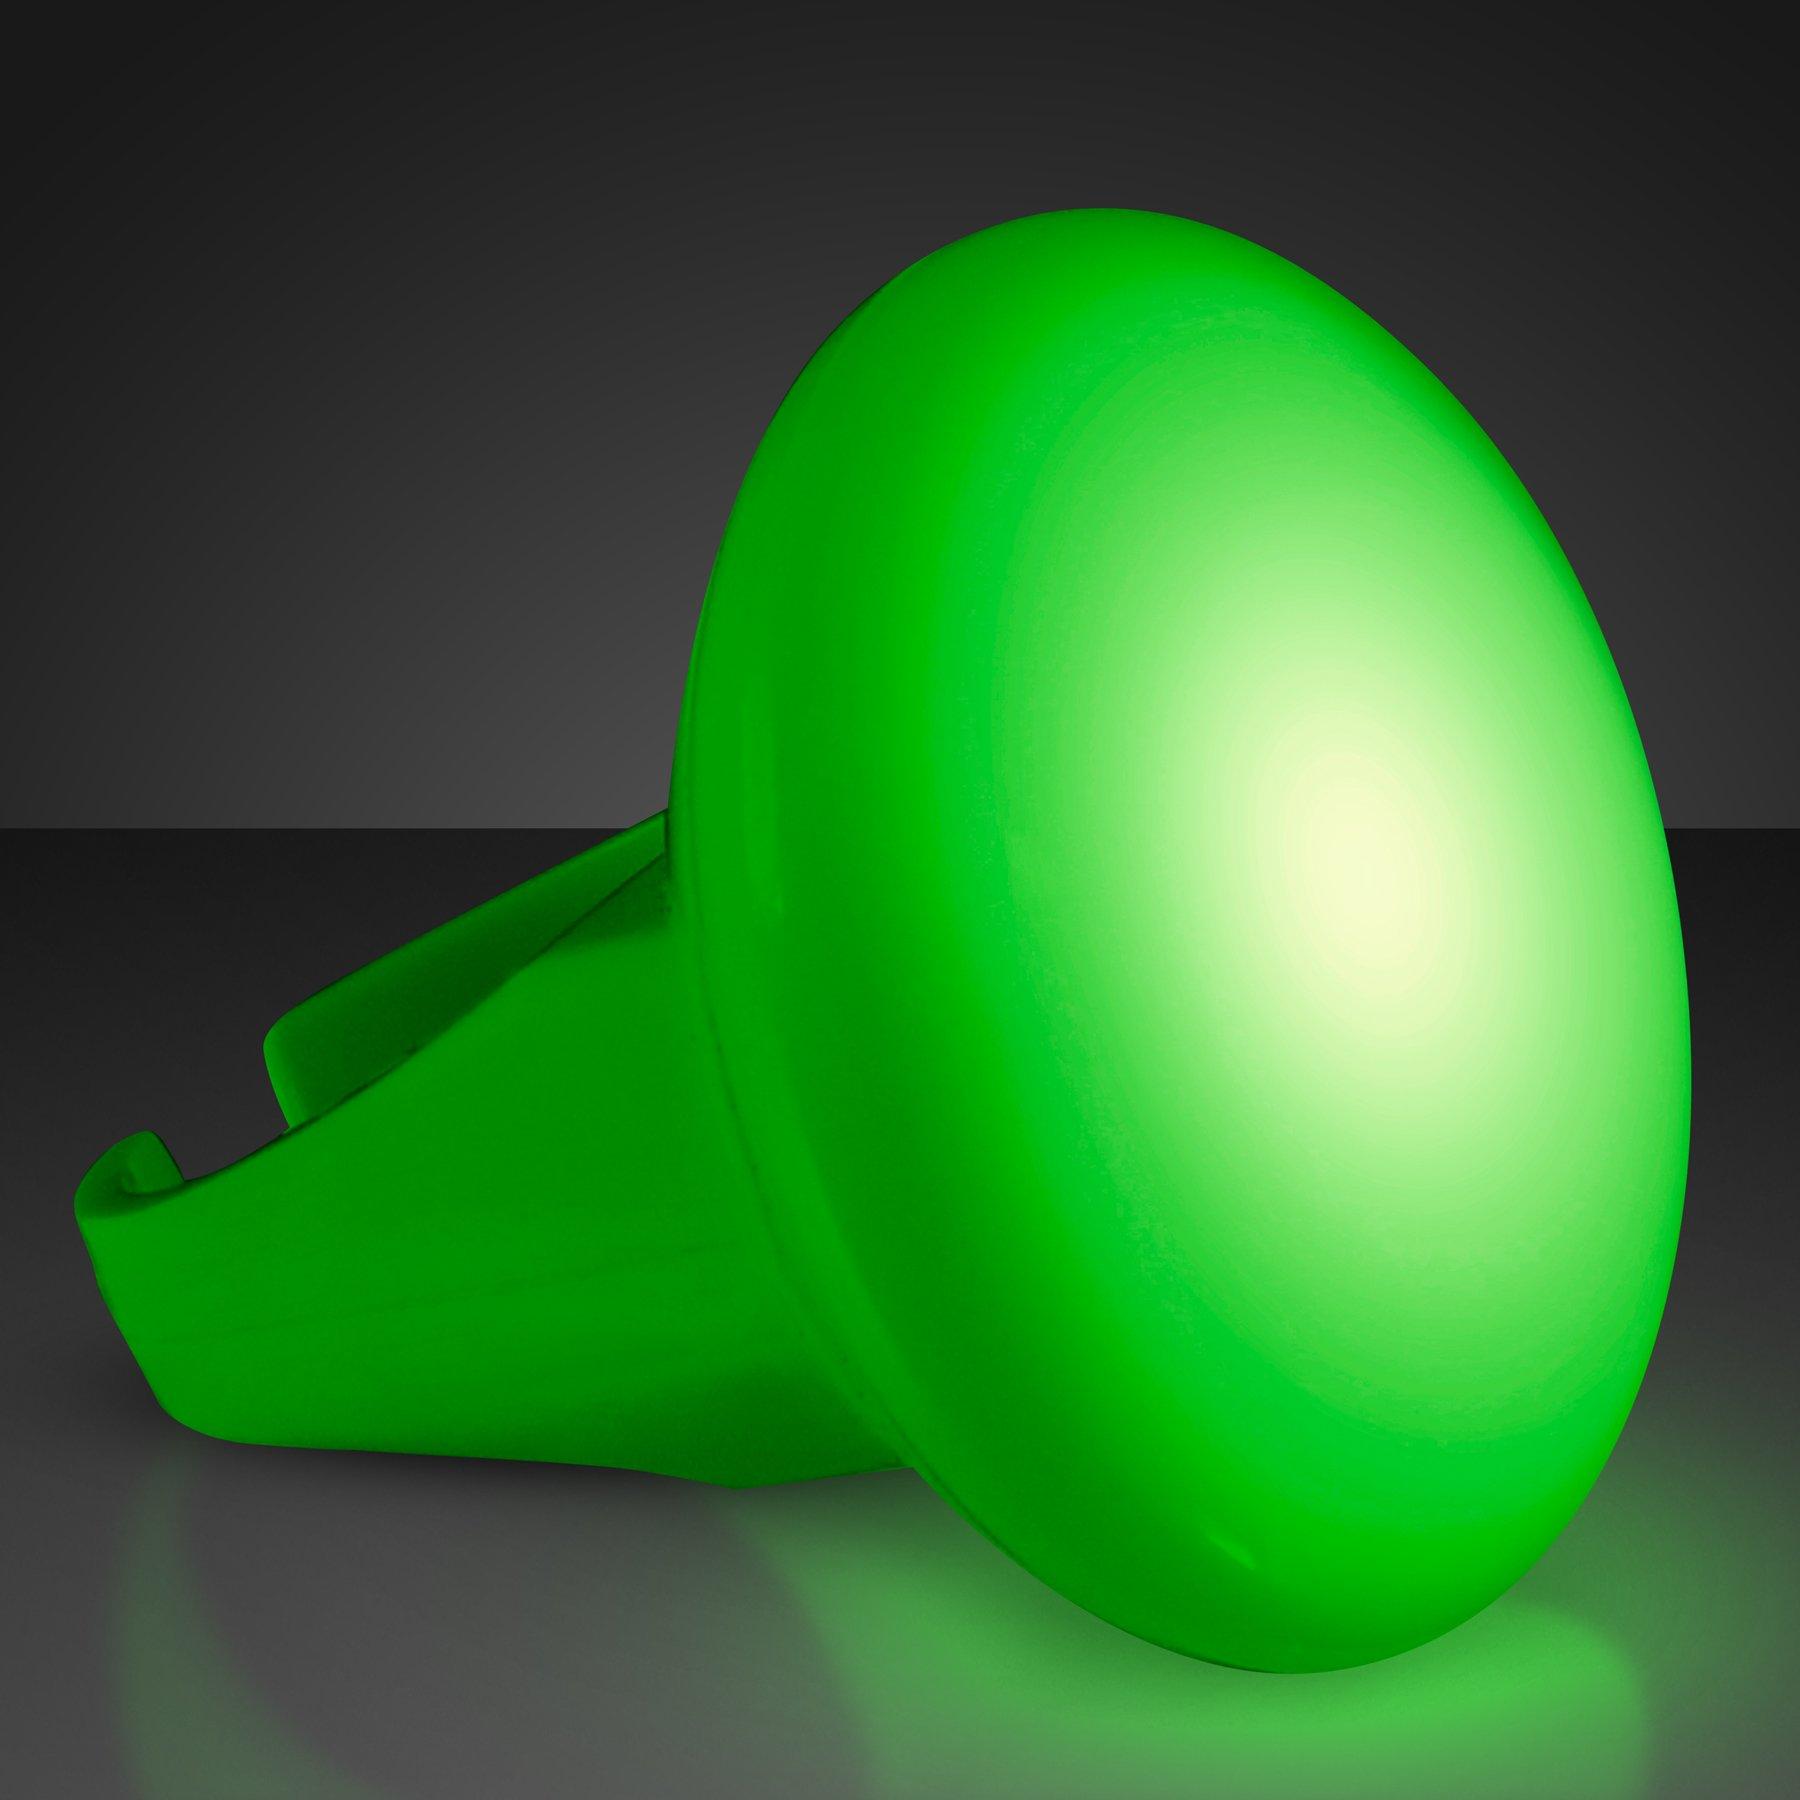 FlashingBlinkyLights Light Up Green Glowing LED Ring (Set of 12)